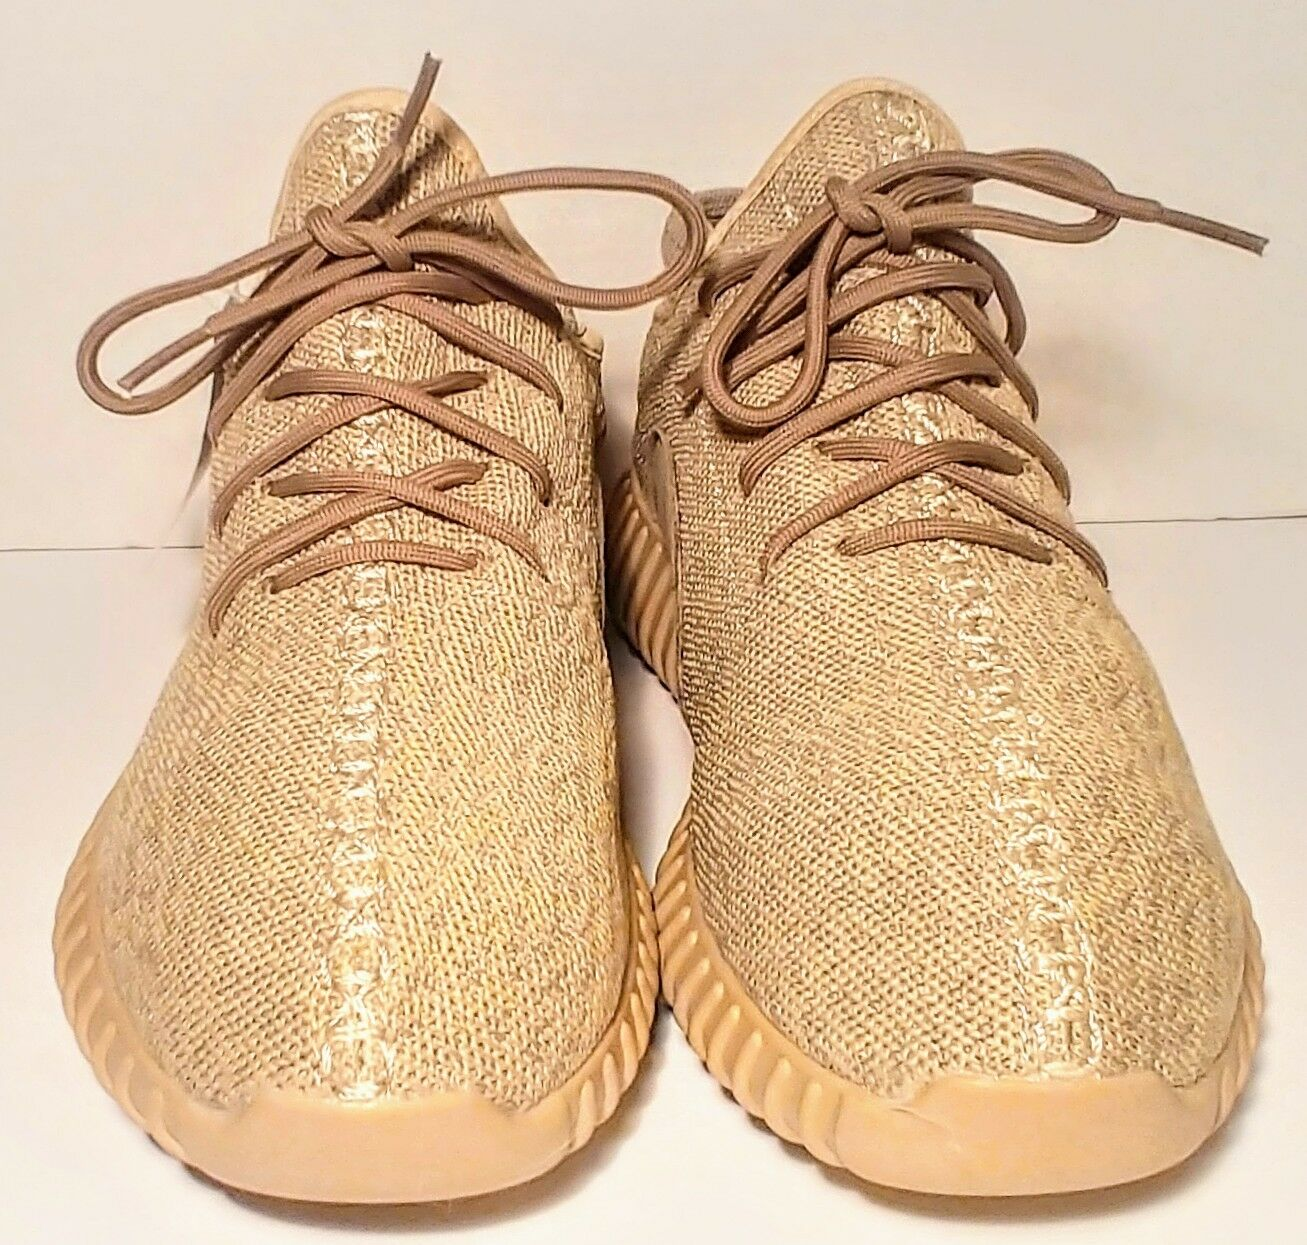 Adidas Yeezy Boost 350 Oxford Tan Size 10 AQ2661 Style Code NWOB